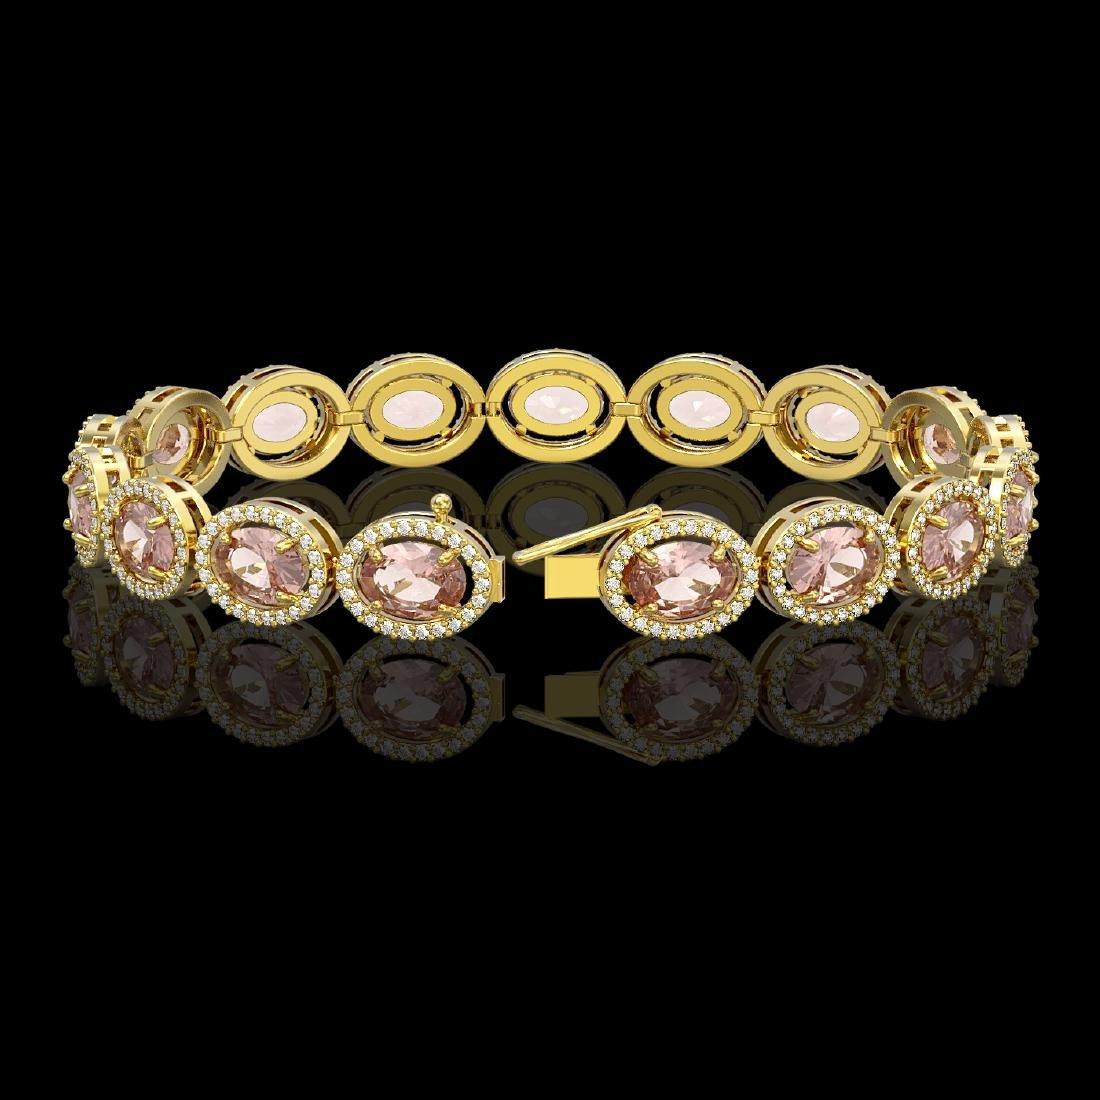 20.18 CTW Morganite & Diamond Halo Bracelet 10K Yellow - 2